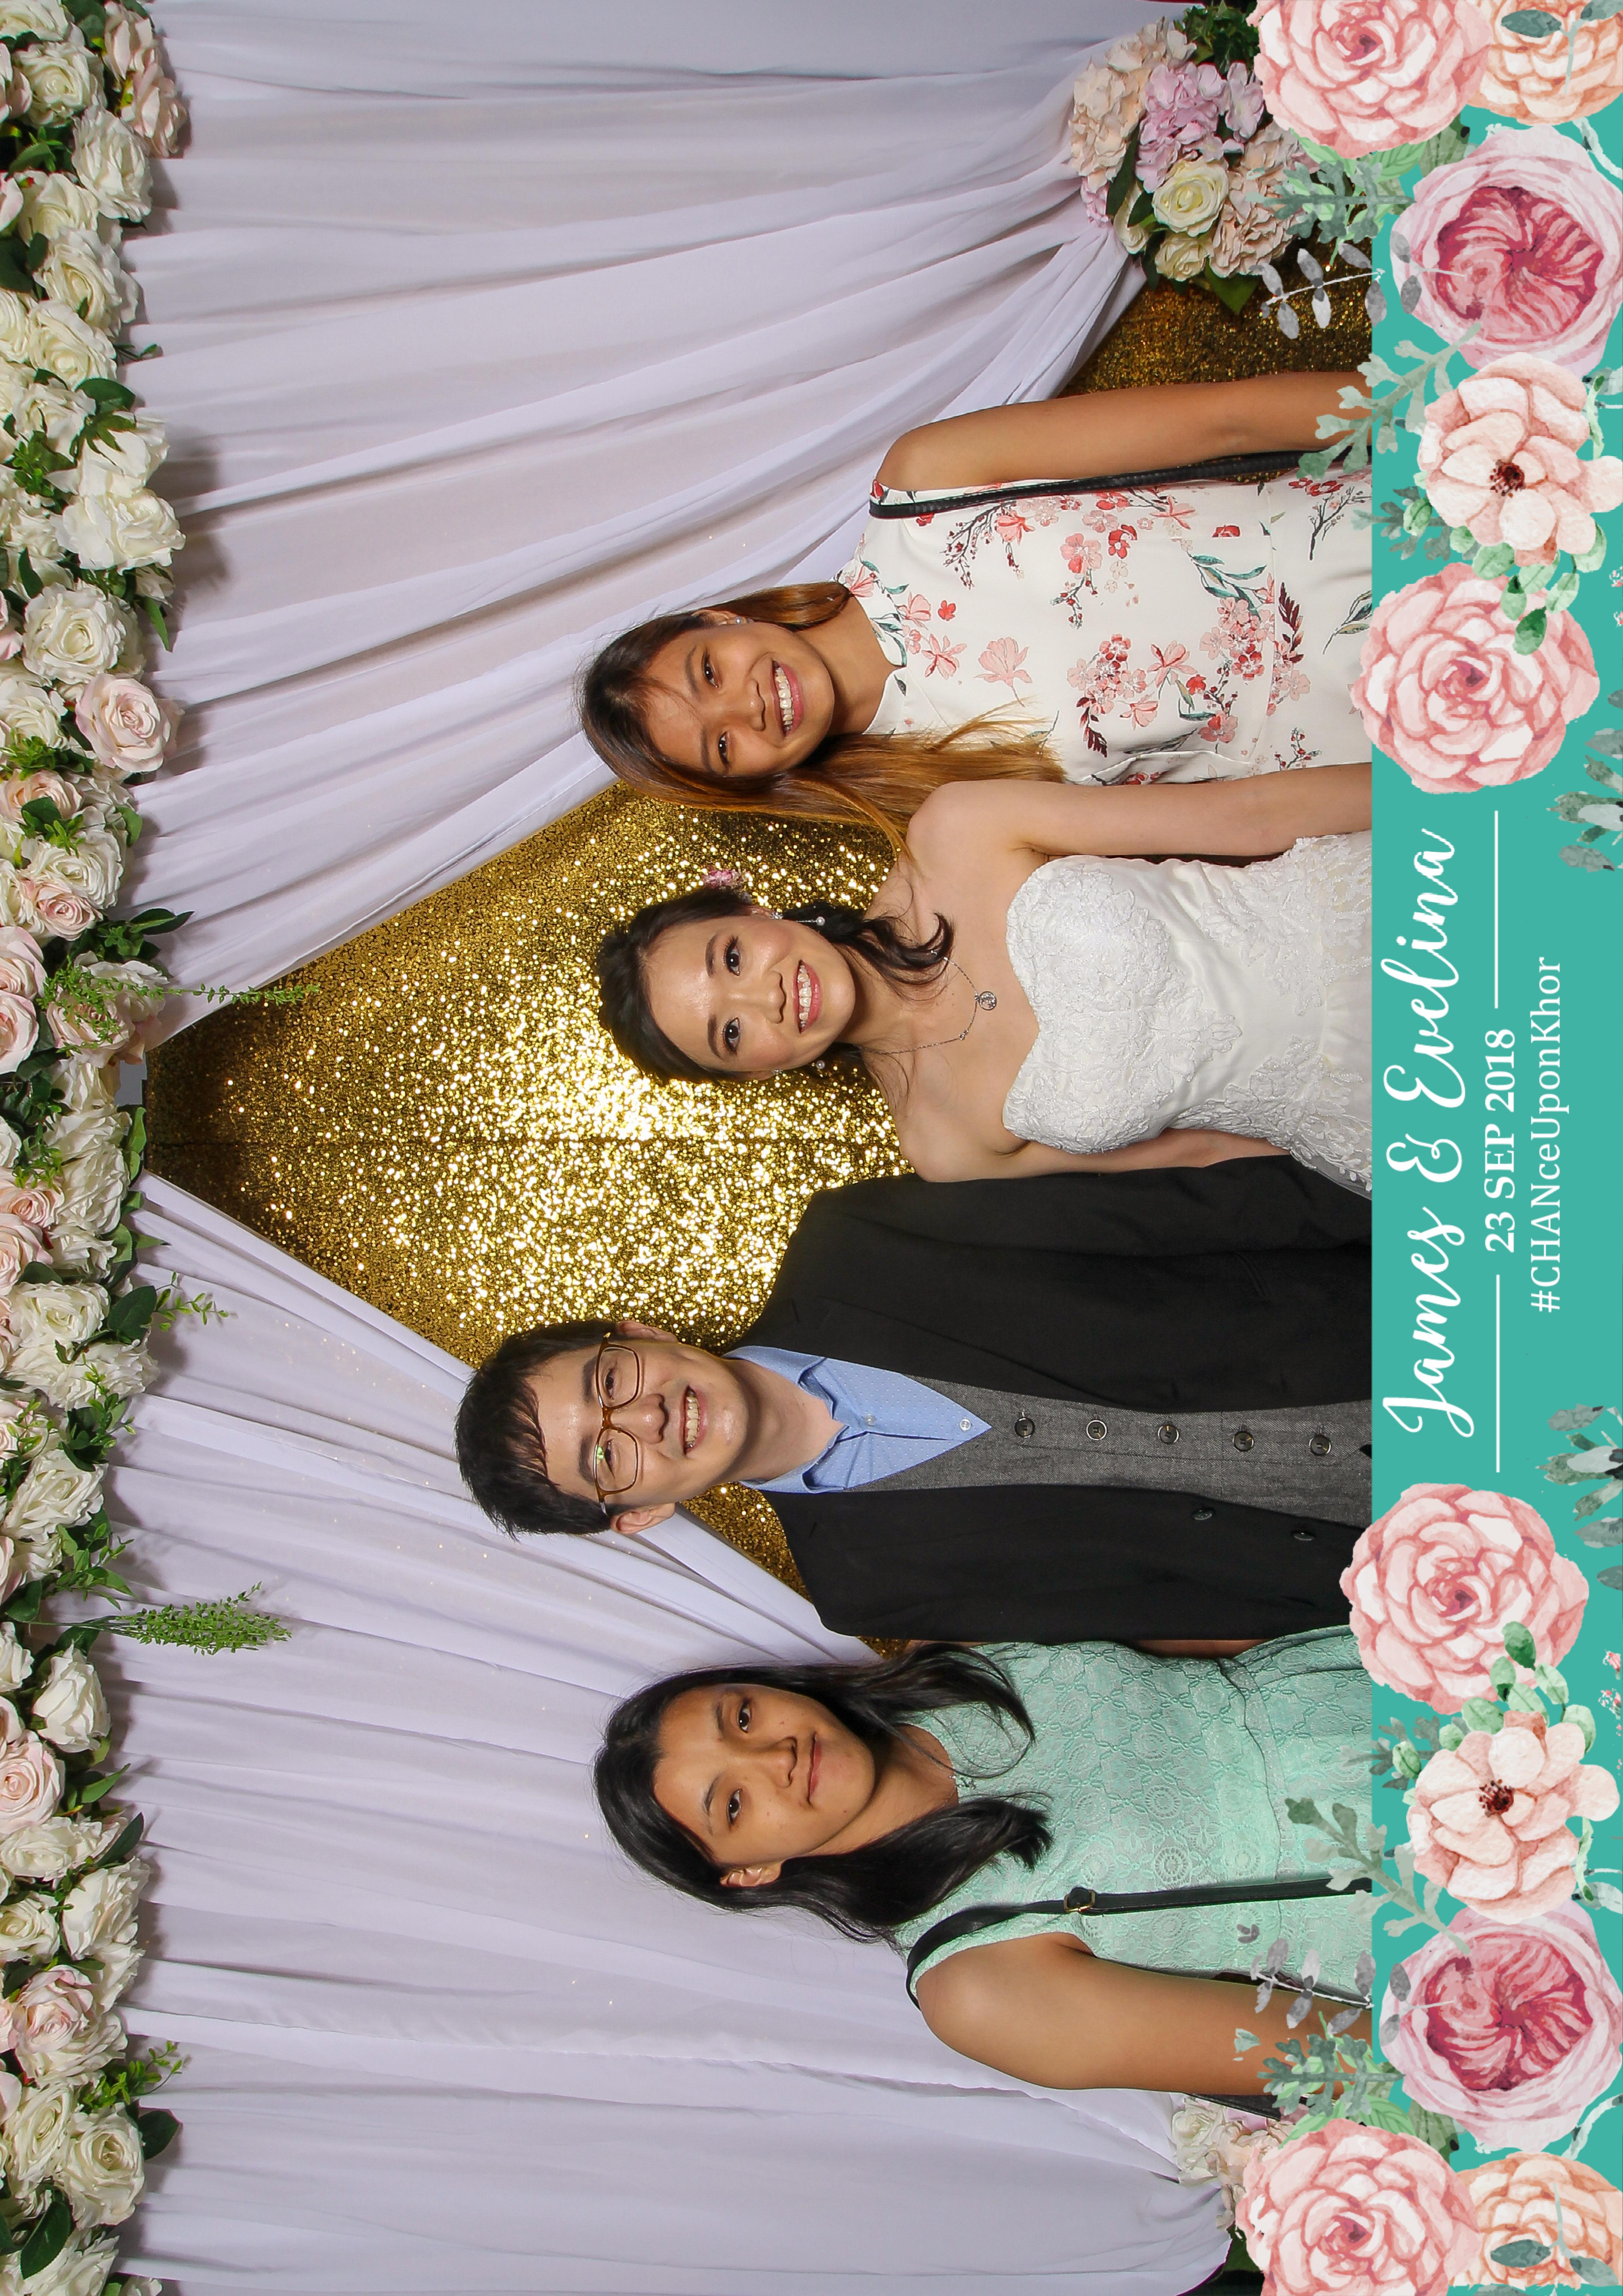 wedding photo booth singapore-15